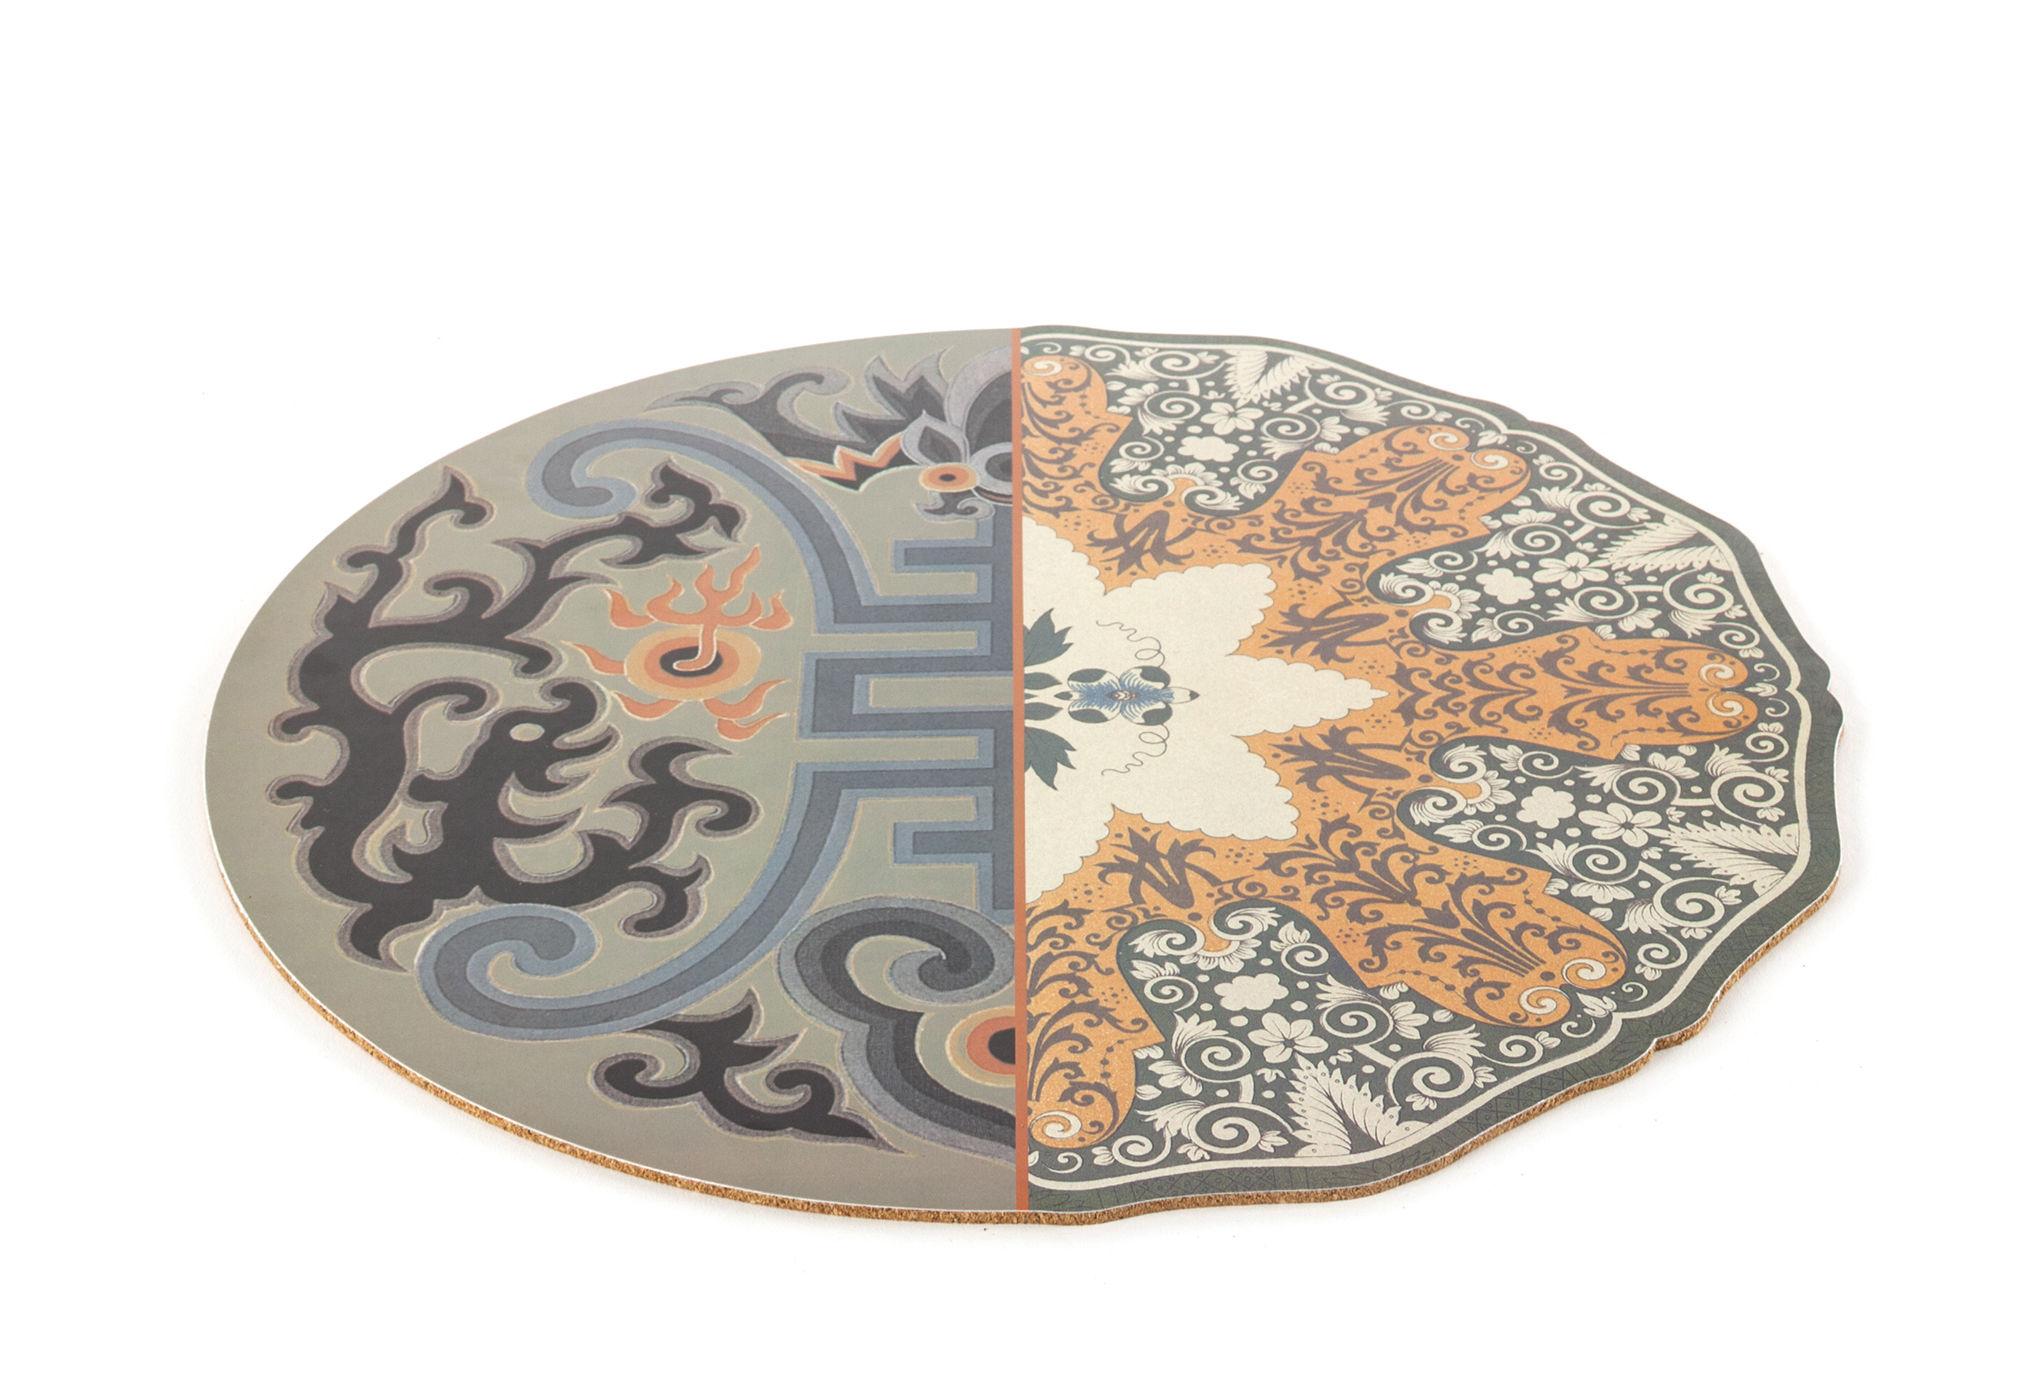 Tableware - Napkins & Tablecloths - Hybrid Marozia Placemat - / Ø 37 cm by Seletti - Marozia - Cork, PVC